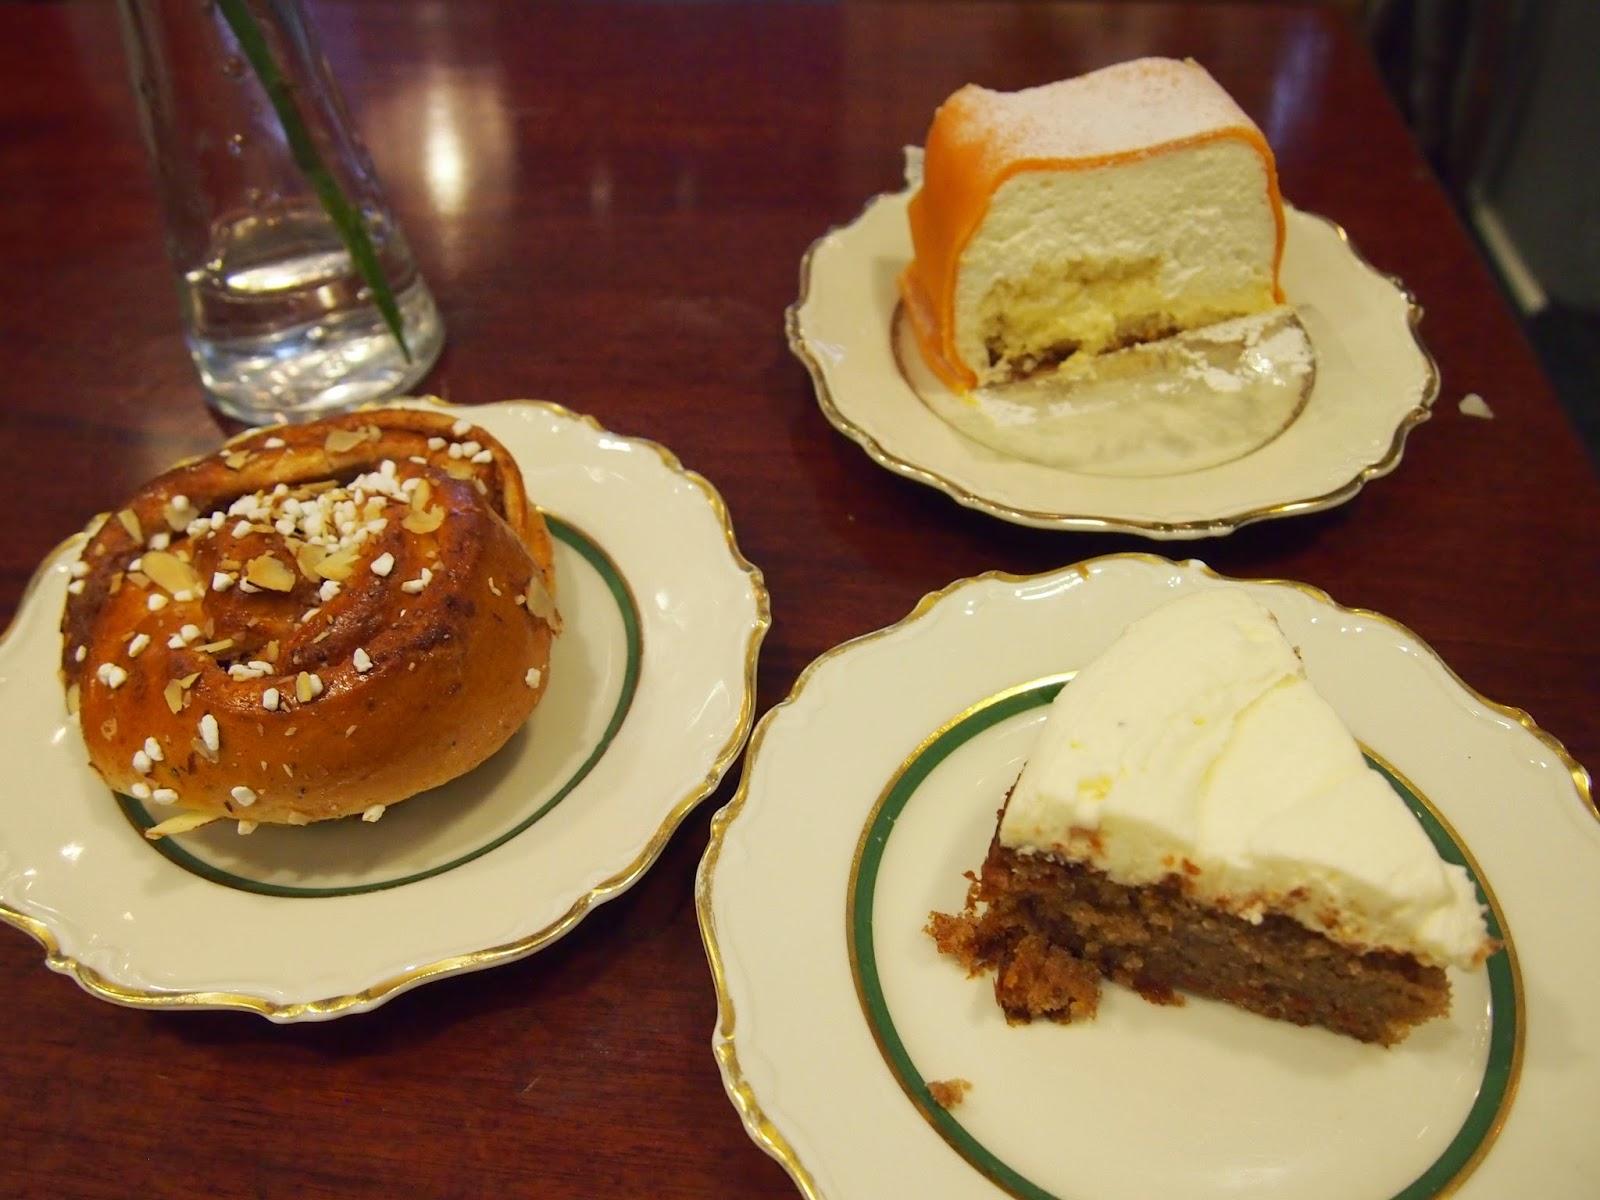 princess cake, cinnamon bun, and carrot cake from Ambrosia cafe in Malmo